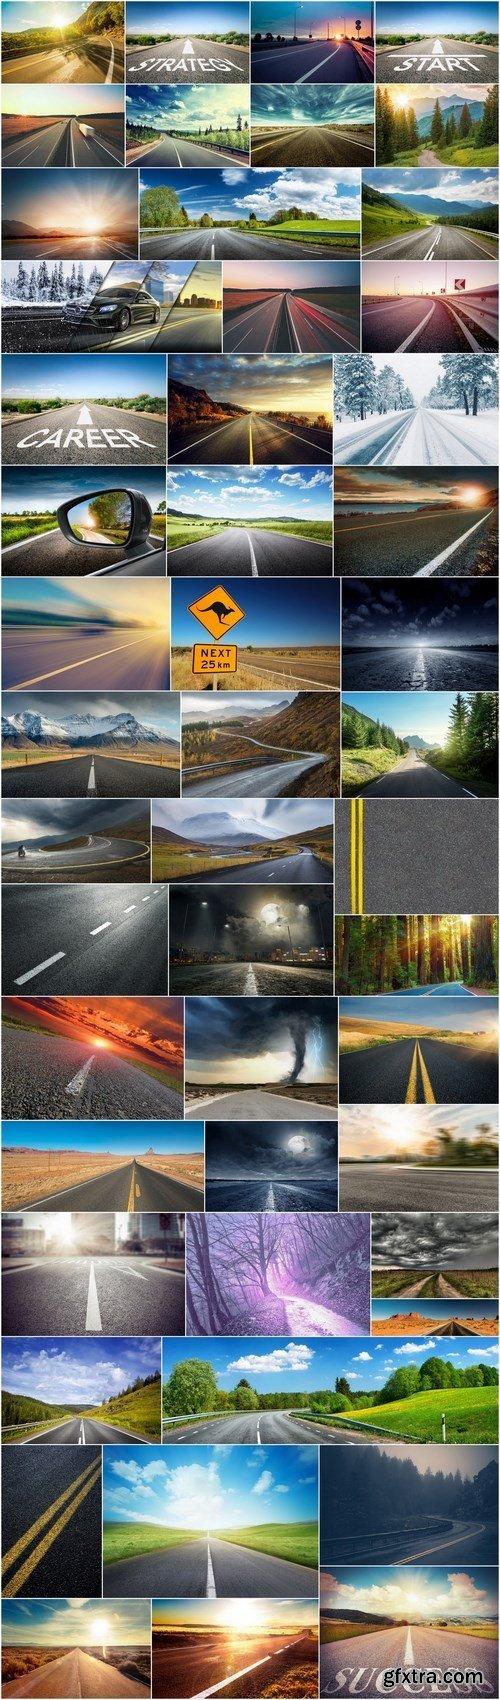 Roads and highway - 50xUHQ JPEG